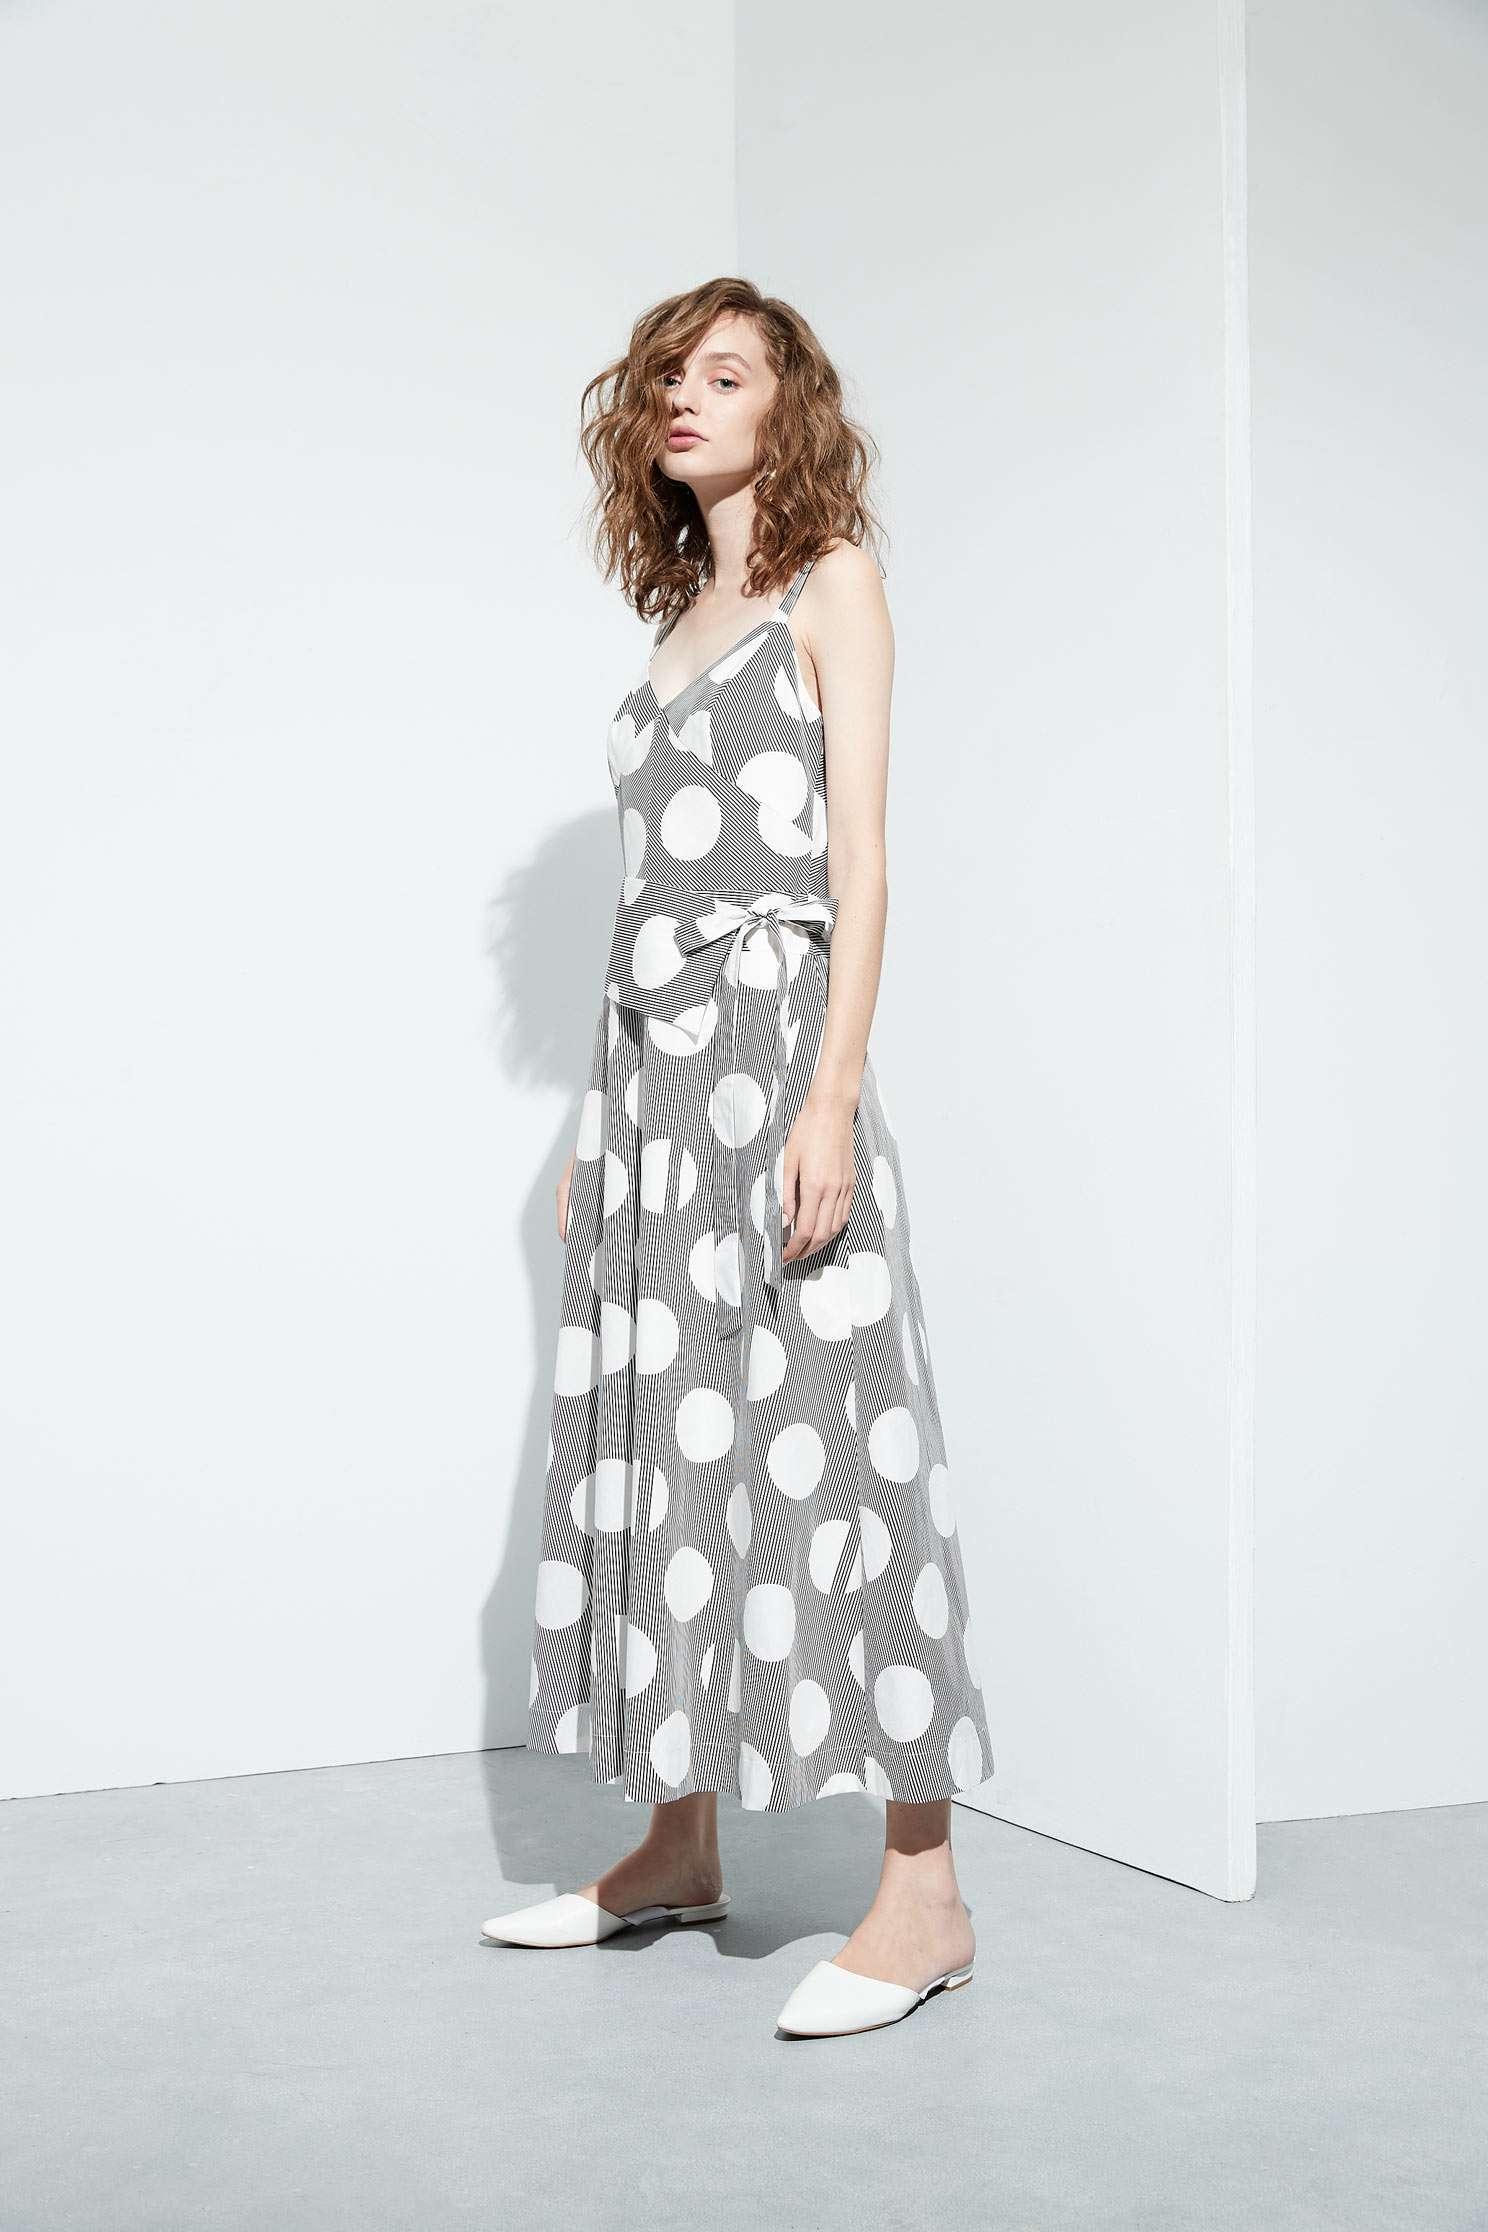 Polka dots slip dress,casualdress,sleevelessdress,spaghettistrapdress